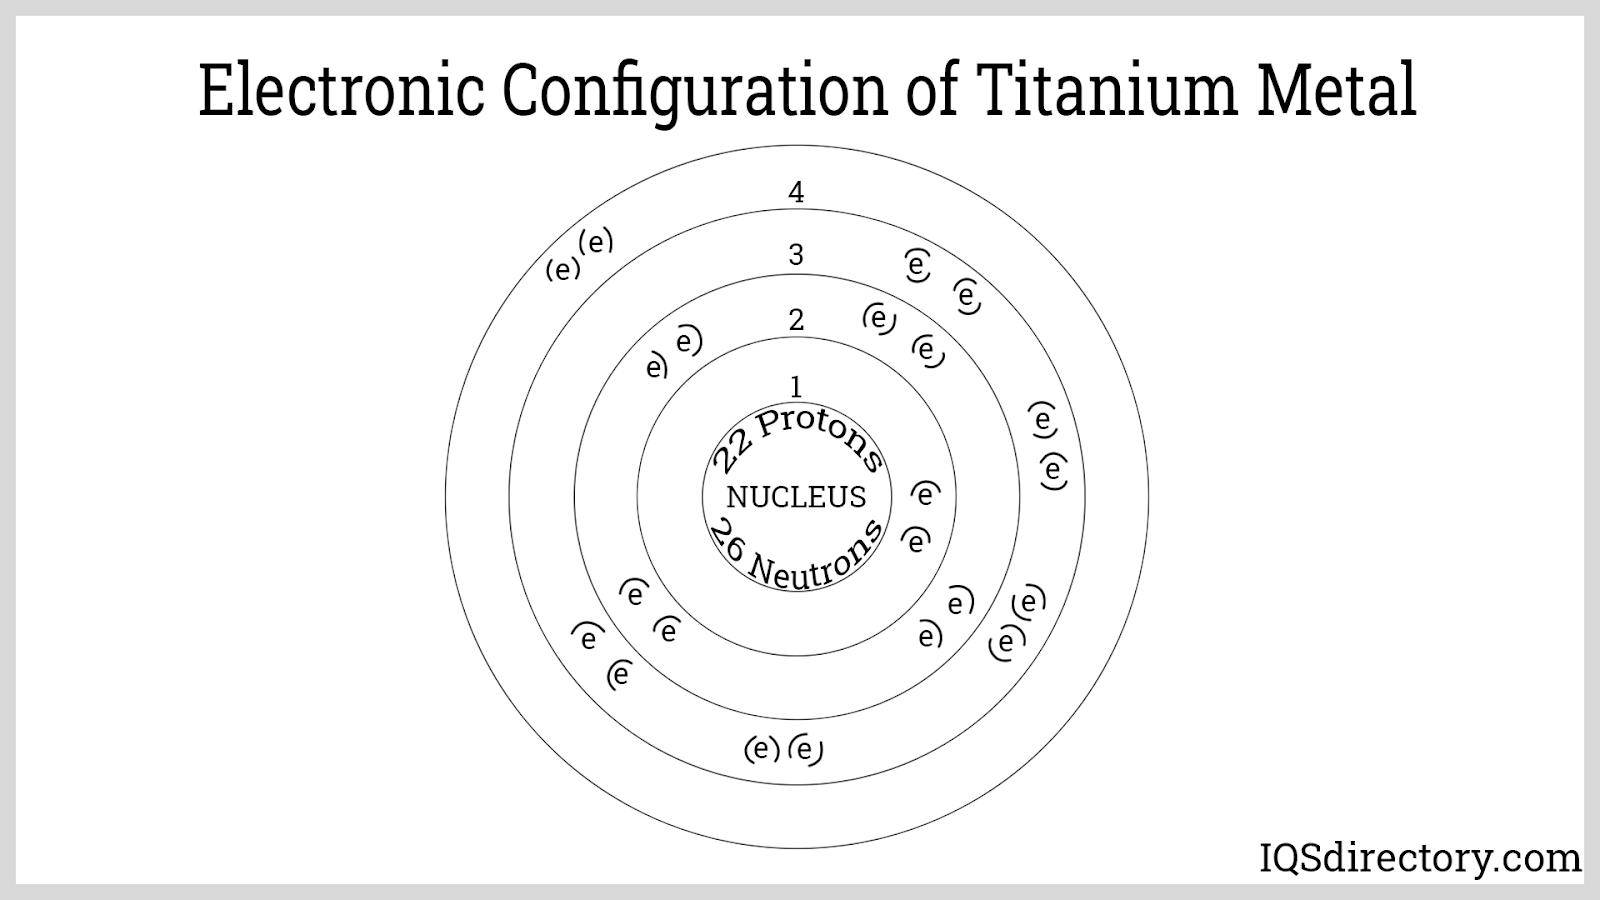 Electronic Configuration of Titanium Metal